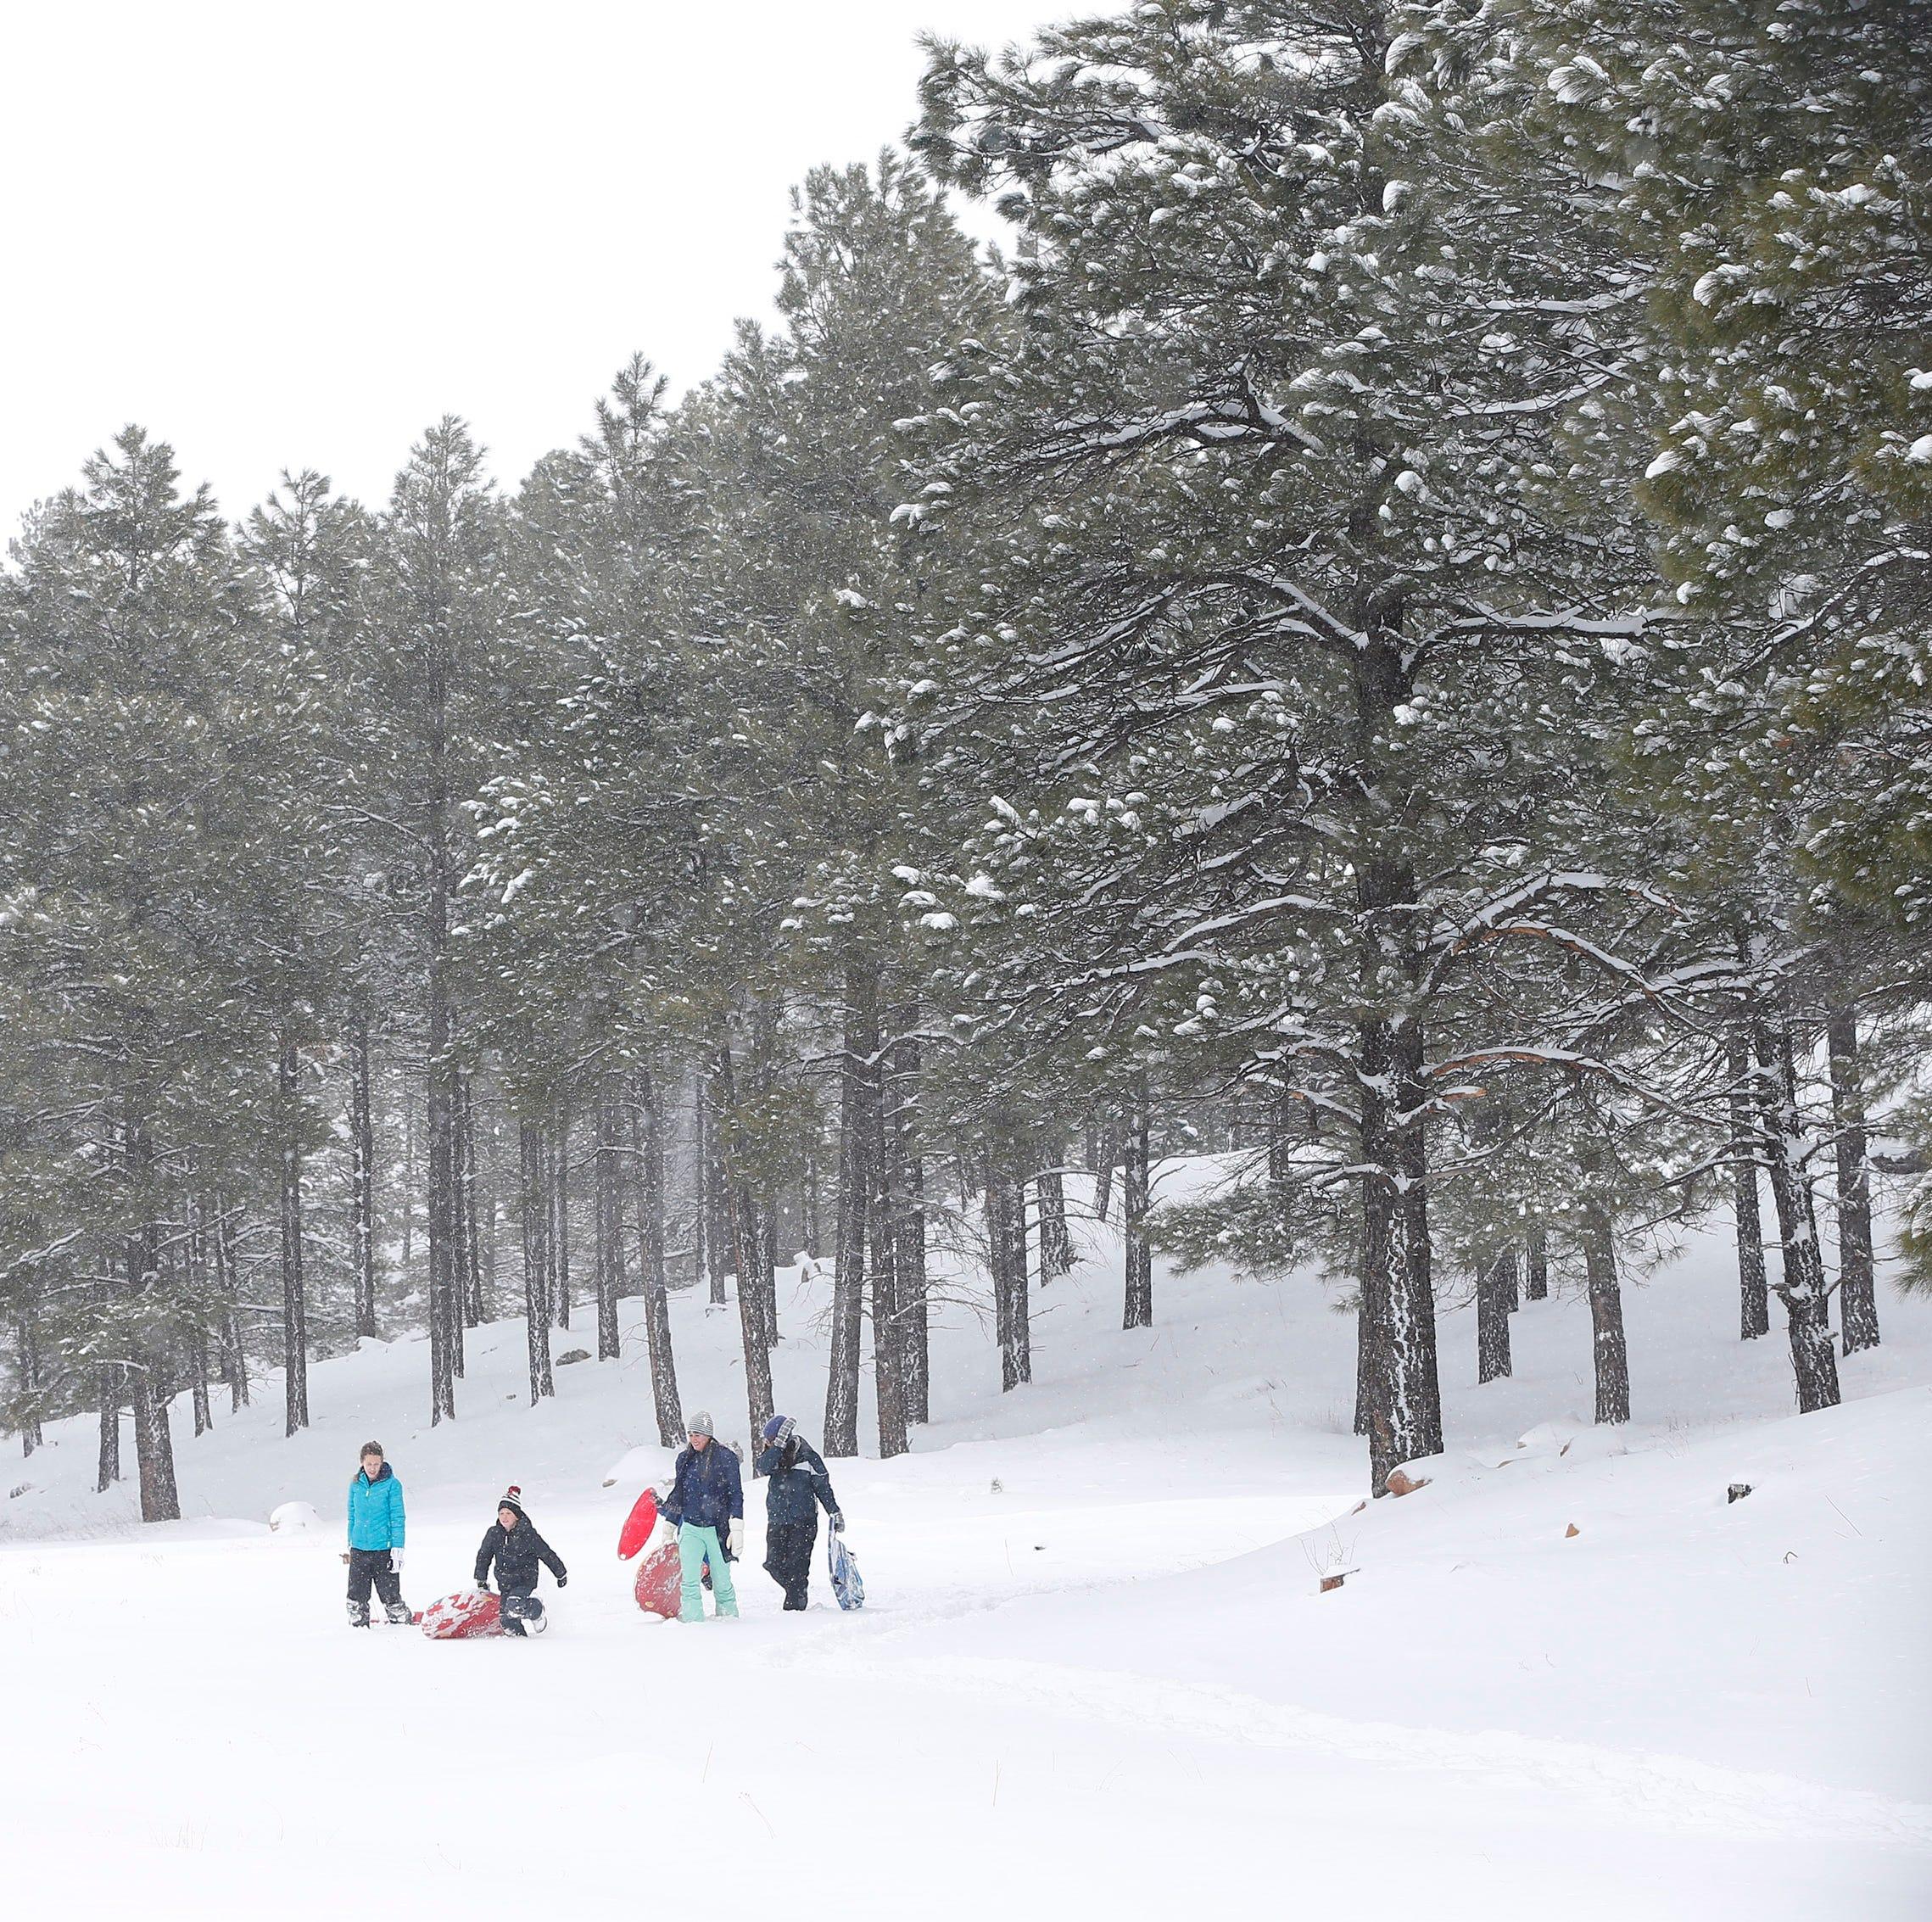 Arizona storm updates: 16 inches at Snowbowl recorded so far